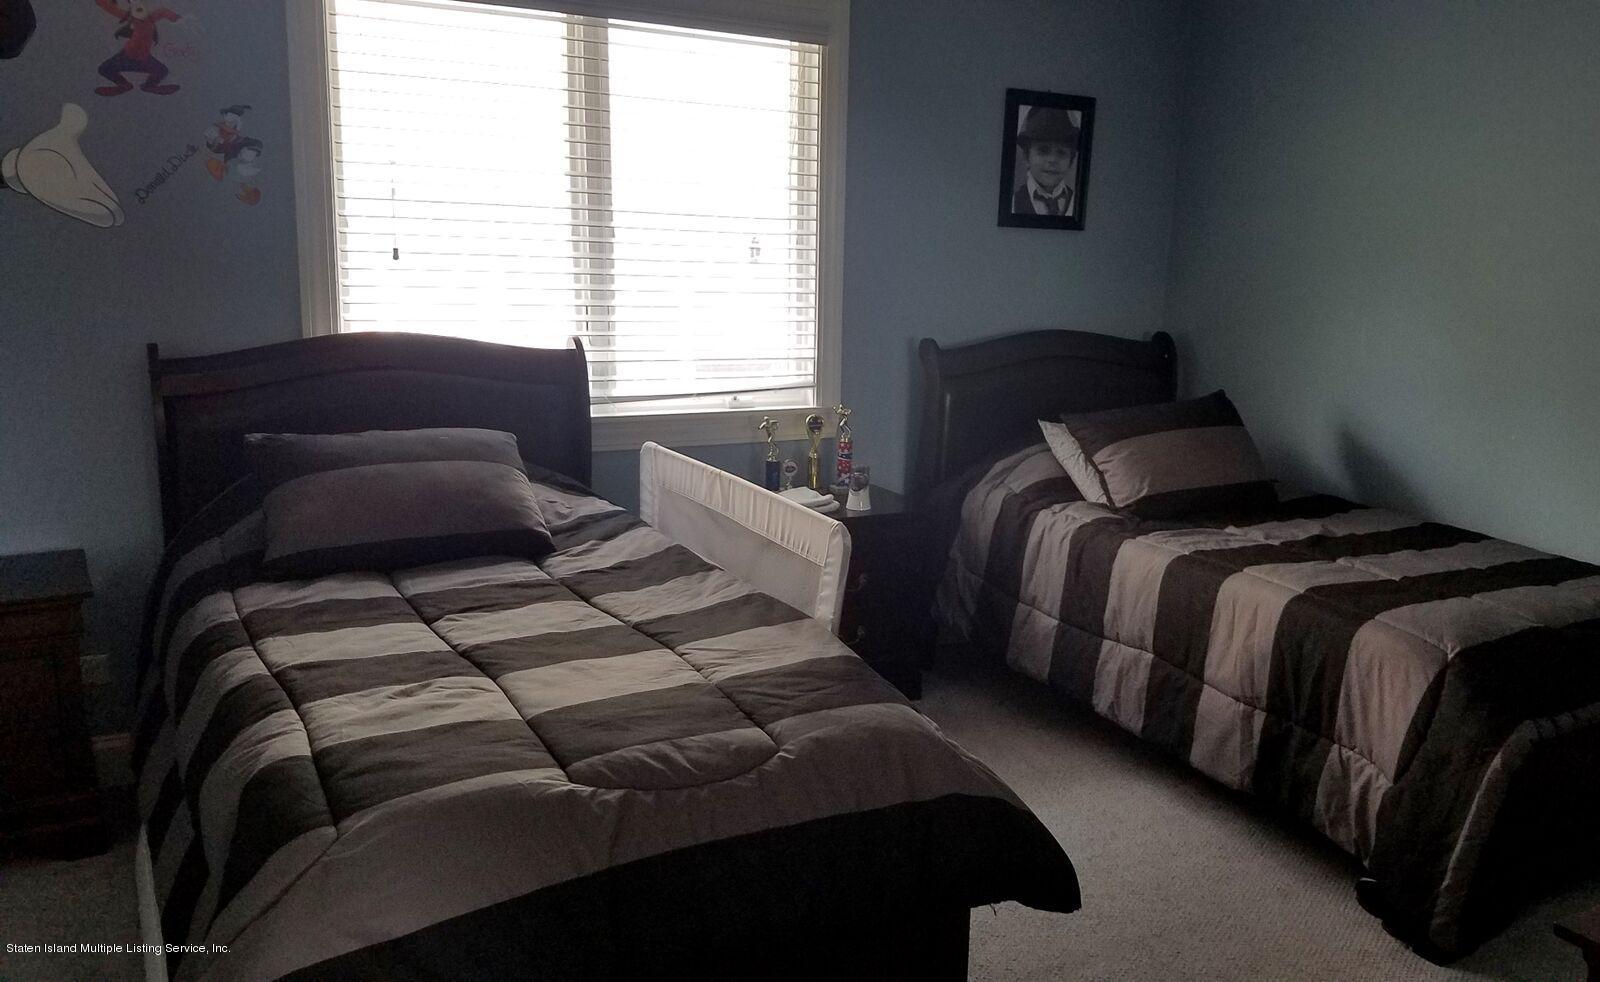 Single Family - Detached 104 Dutchess Ave   Staten Island, NY 10304, MLS-1113043-11